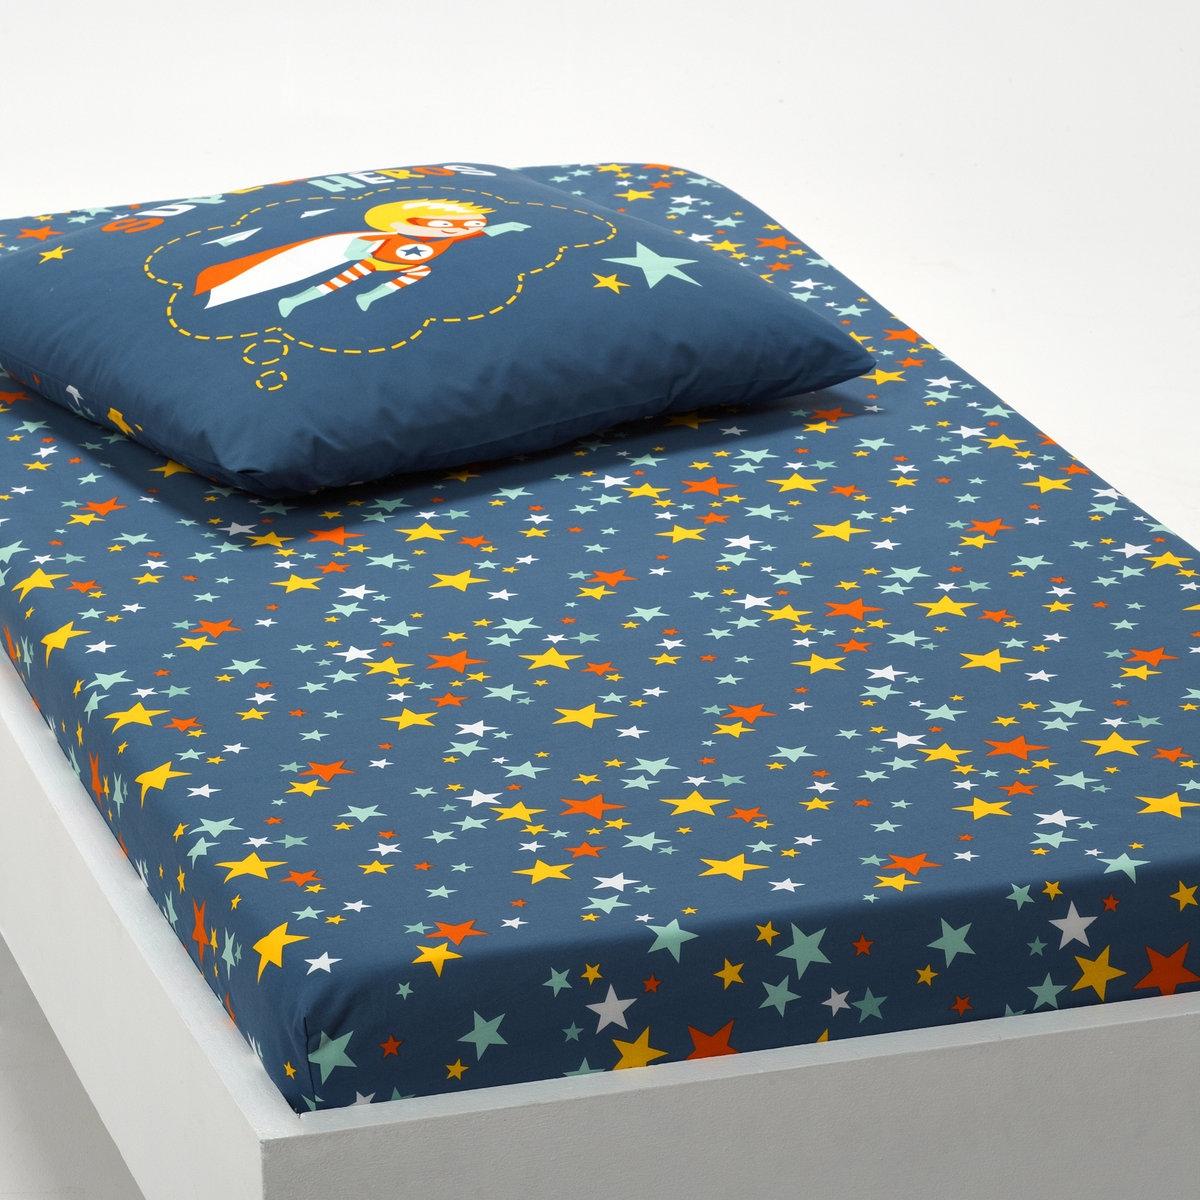 цена Натяжная простыня La Redoute С рисунком Super Hros 90 x 190 см синий онлайн в 2017 году